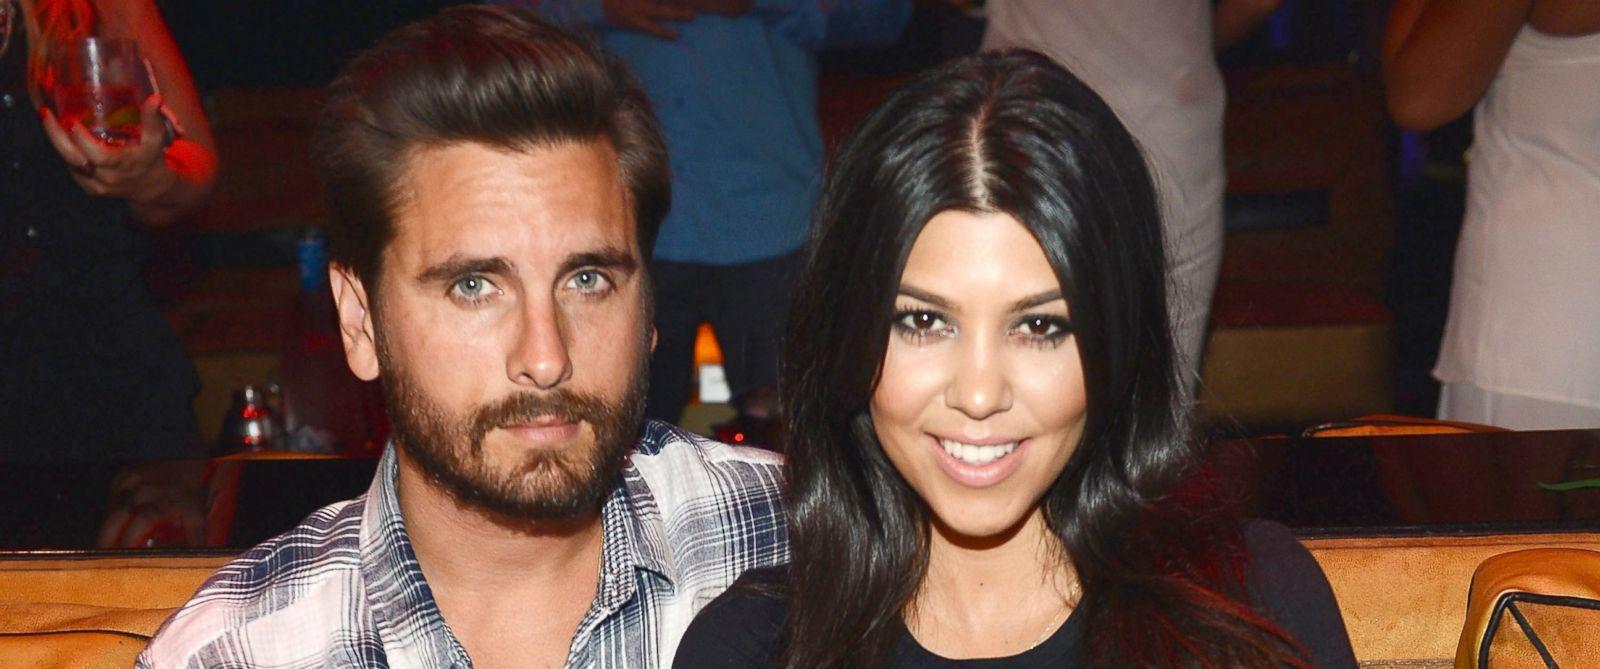 PHOTO: Scott Disick and Kourtney Kardashian celebrate Kourtney Kardashians birthday at 1 OAK Nightclub at The Mirage Hotel & Casino on April 18, 2015 in Las Vegas.